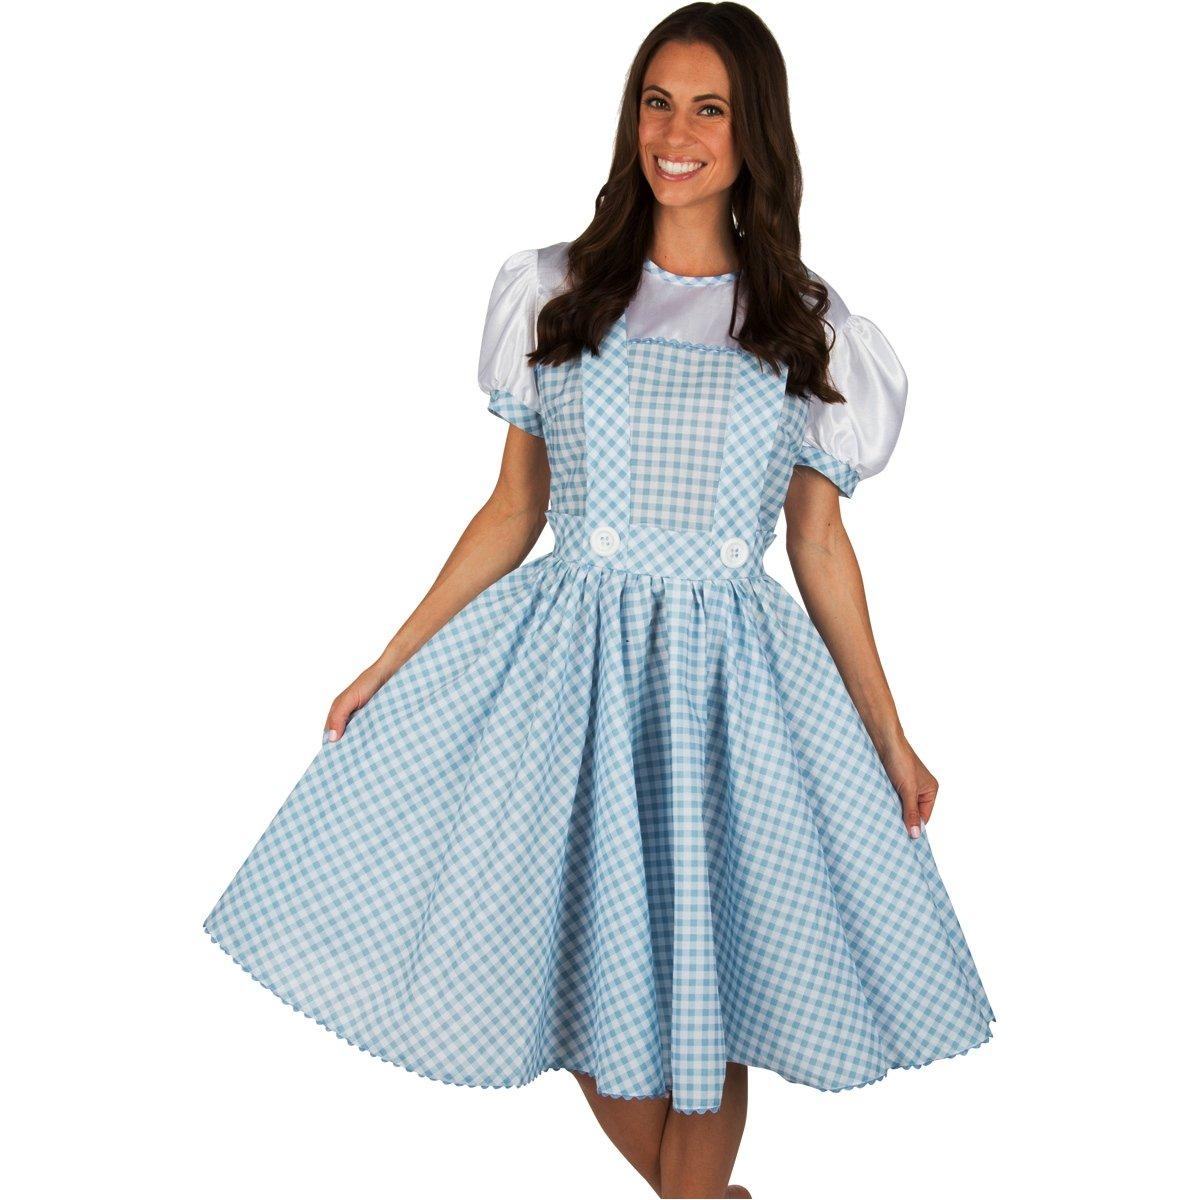 Kidcostumes Adult Dorothy Wizard of Oz Dress Costume (Medium Adult) by Kidcostumes (Image #1)